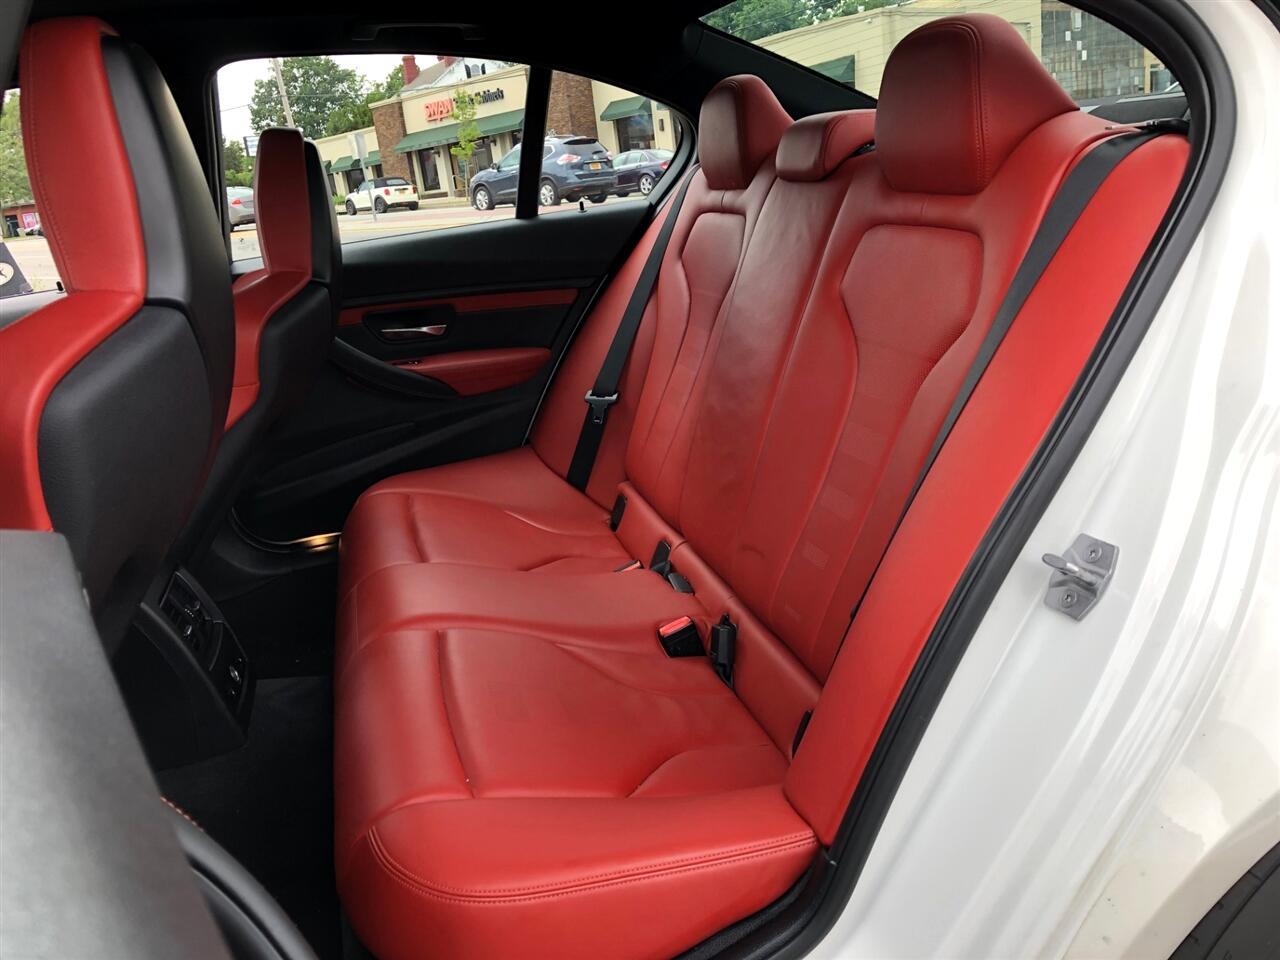 BMW M3 4dr Sdn 2016